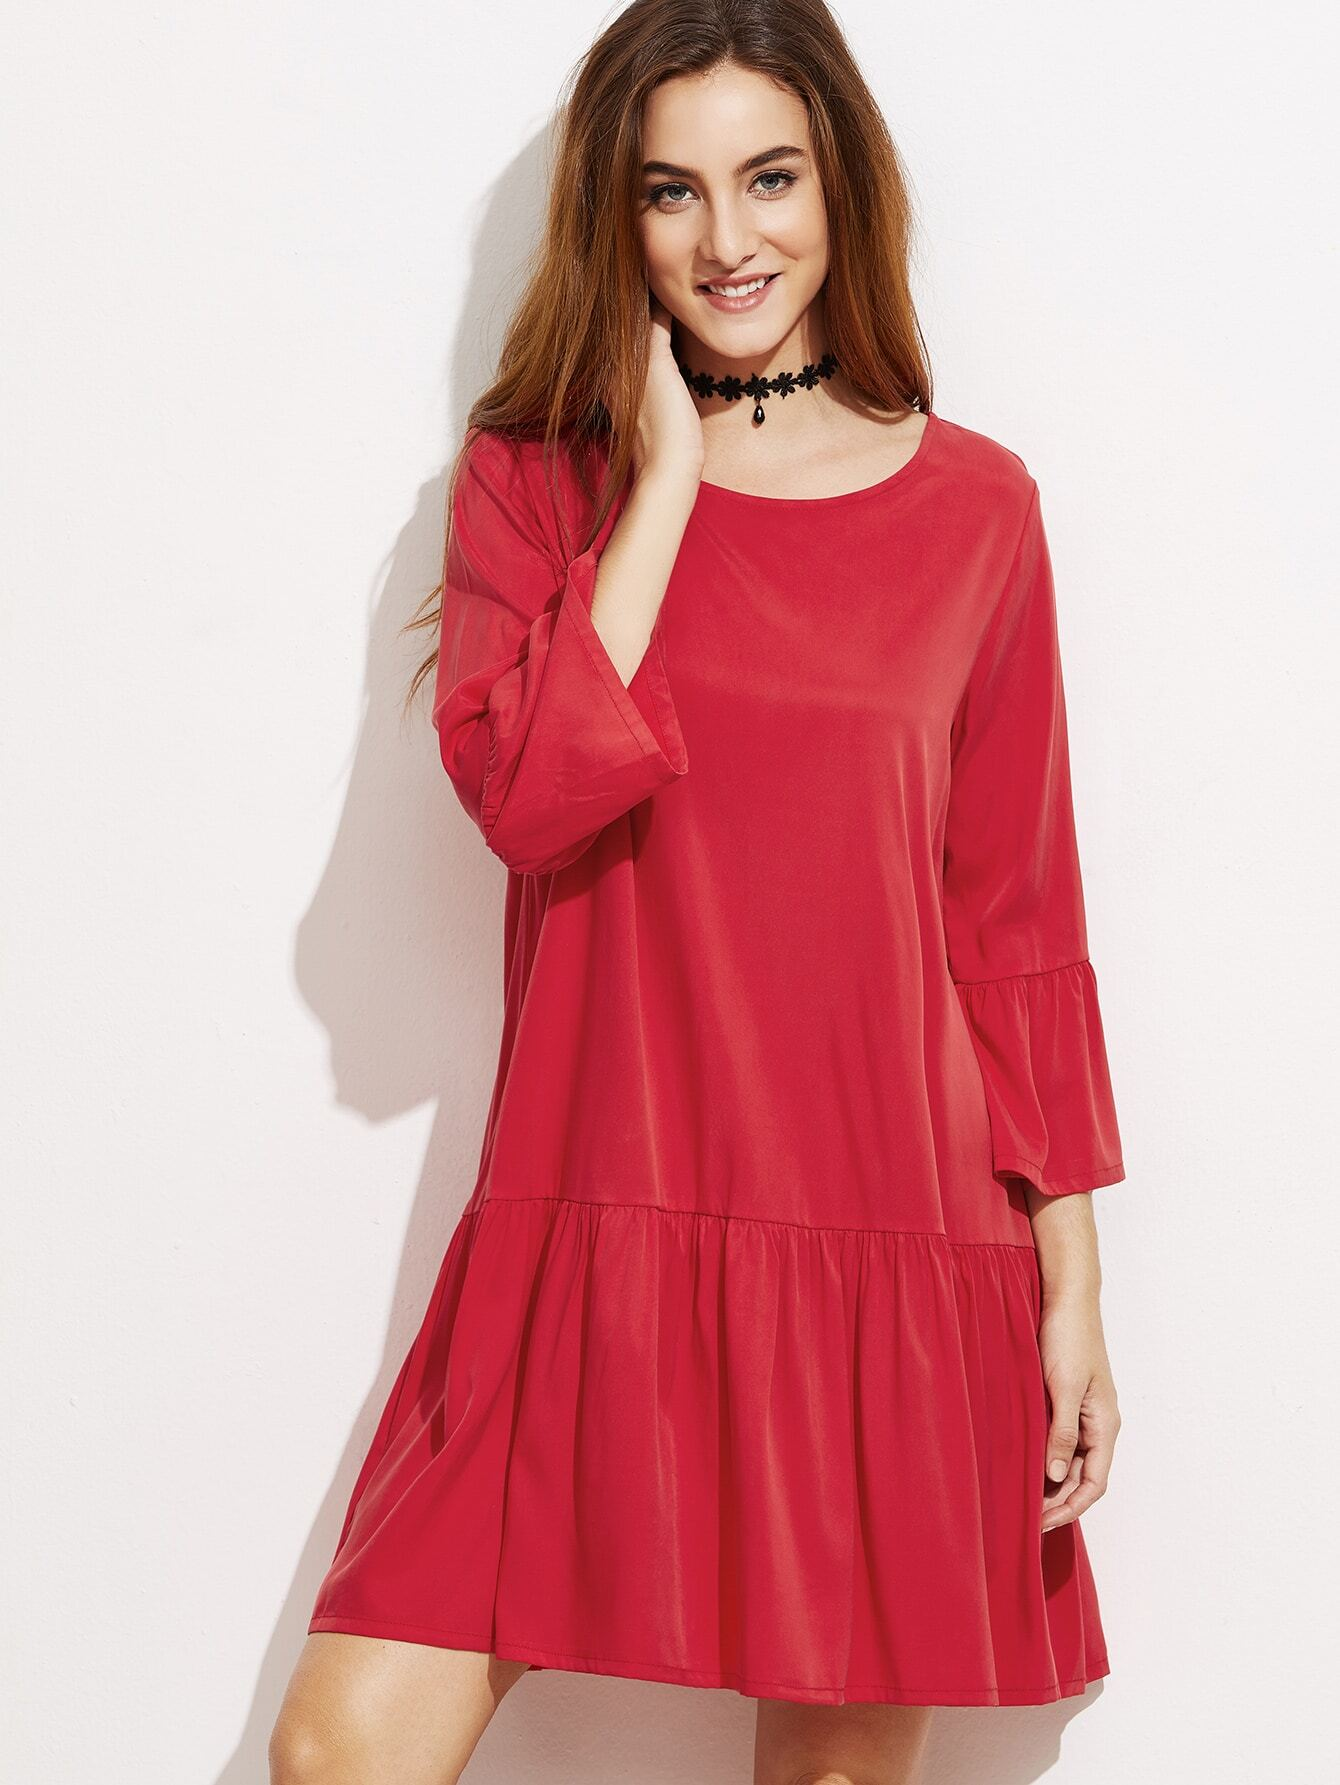 SheIn Red Keyhole Back Ruffle Trim Dress